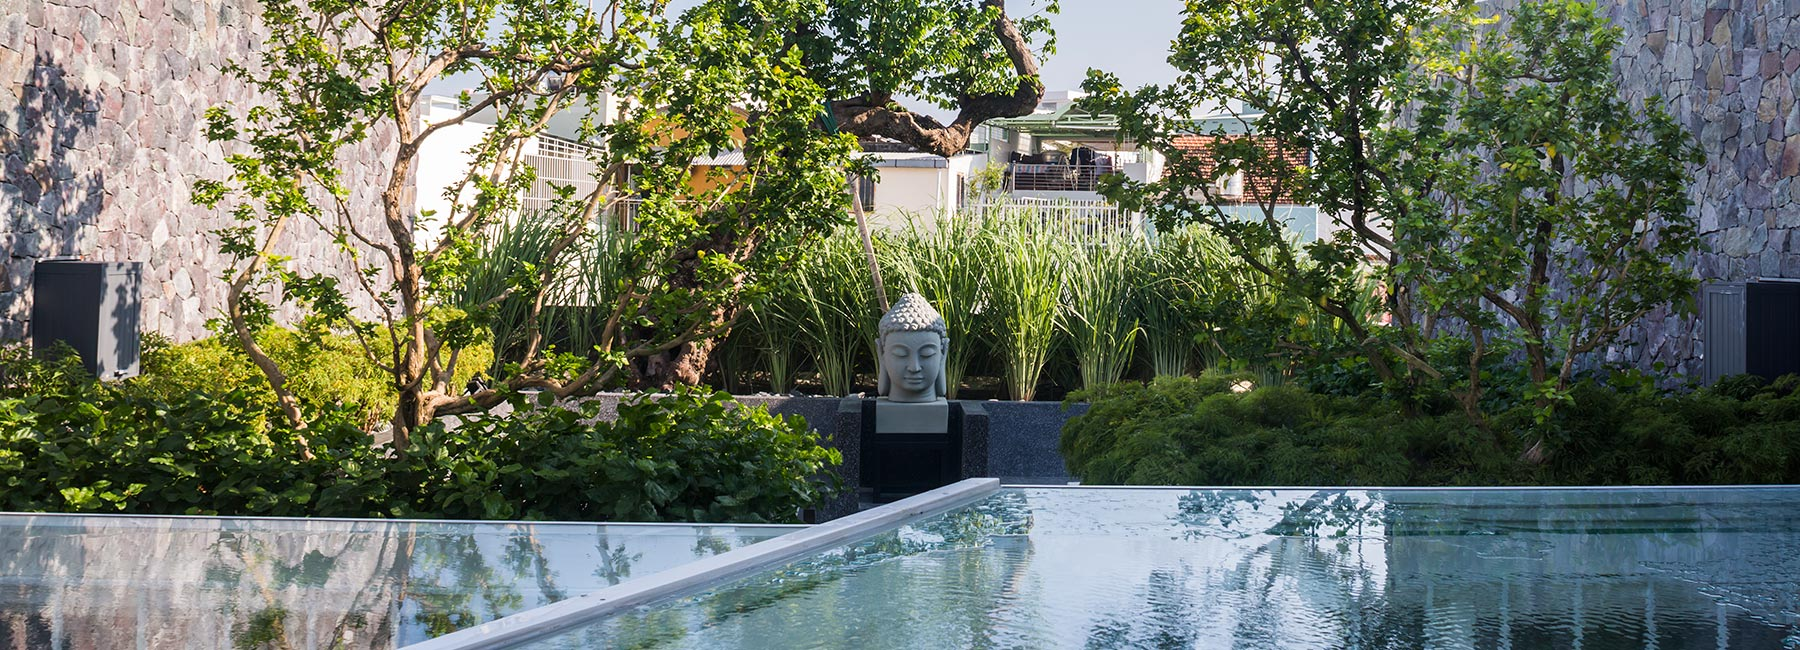 mw-archstudio-204-house-nha-trang-vietnam-designboom-1800.jpg